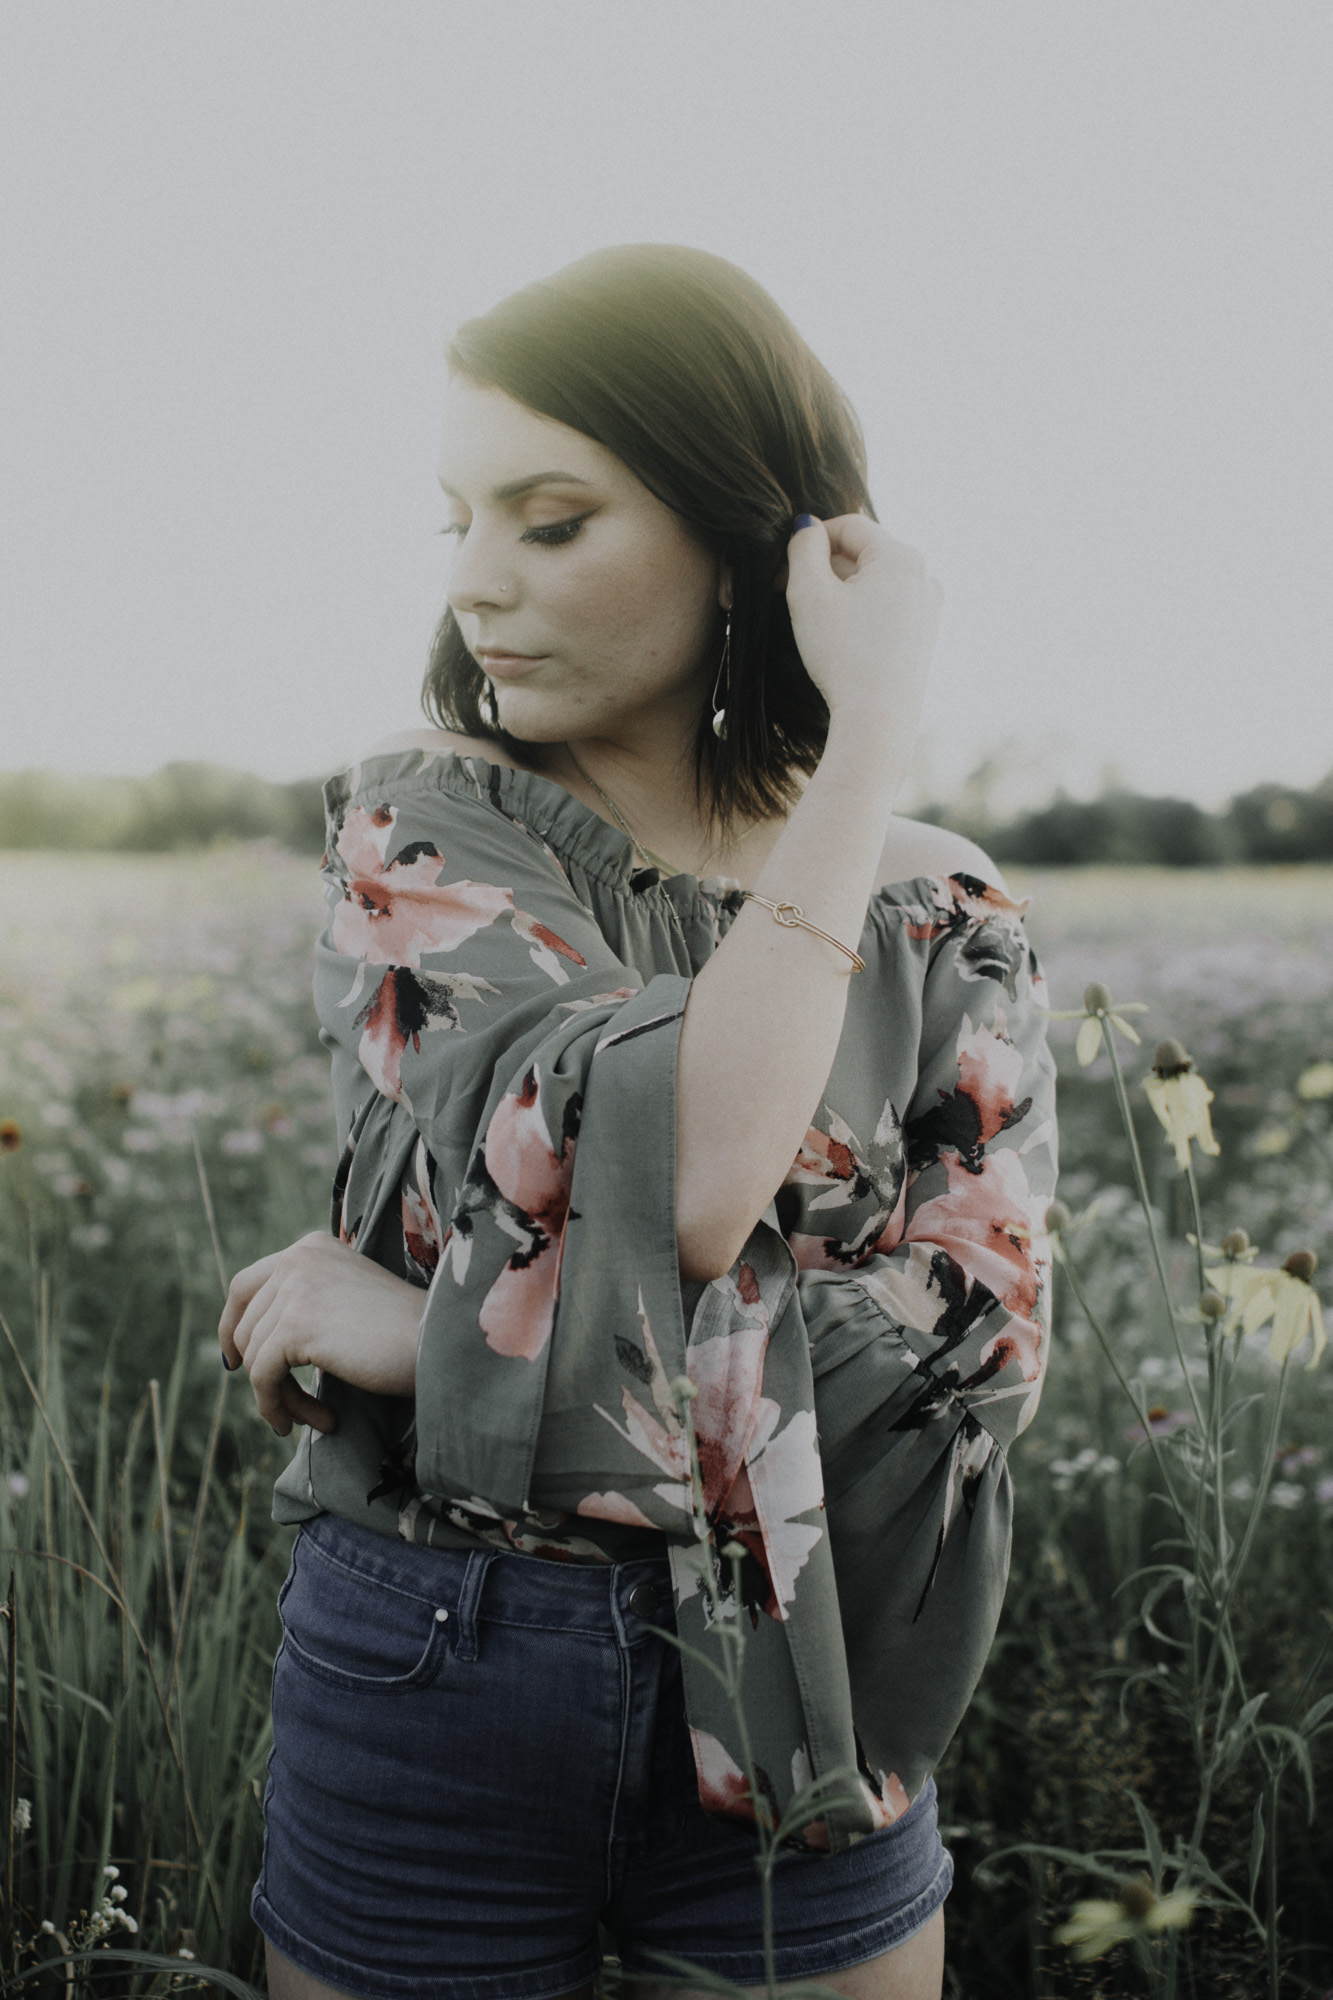 Cate_Ann_Photography_Dayton_Ohio_Wedding_Elopement_And_Engagement_Photographeruntitled-30.jpg